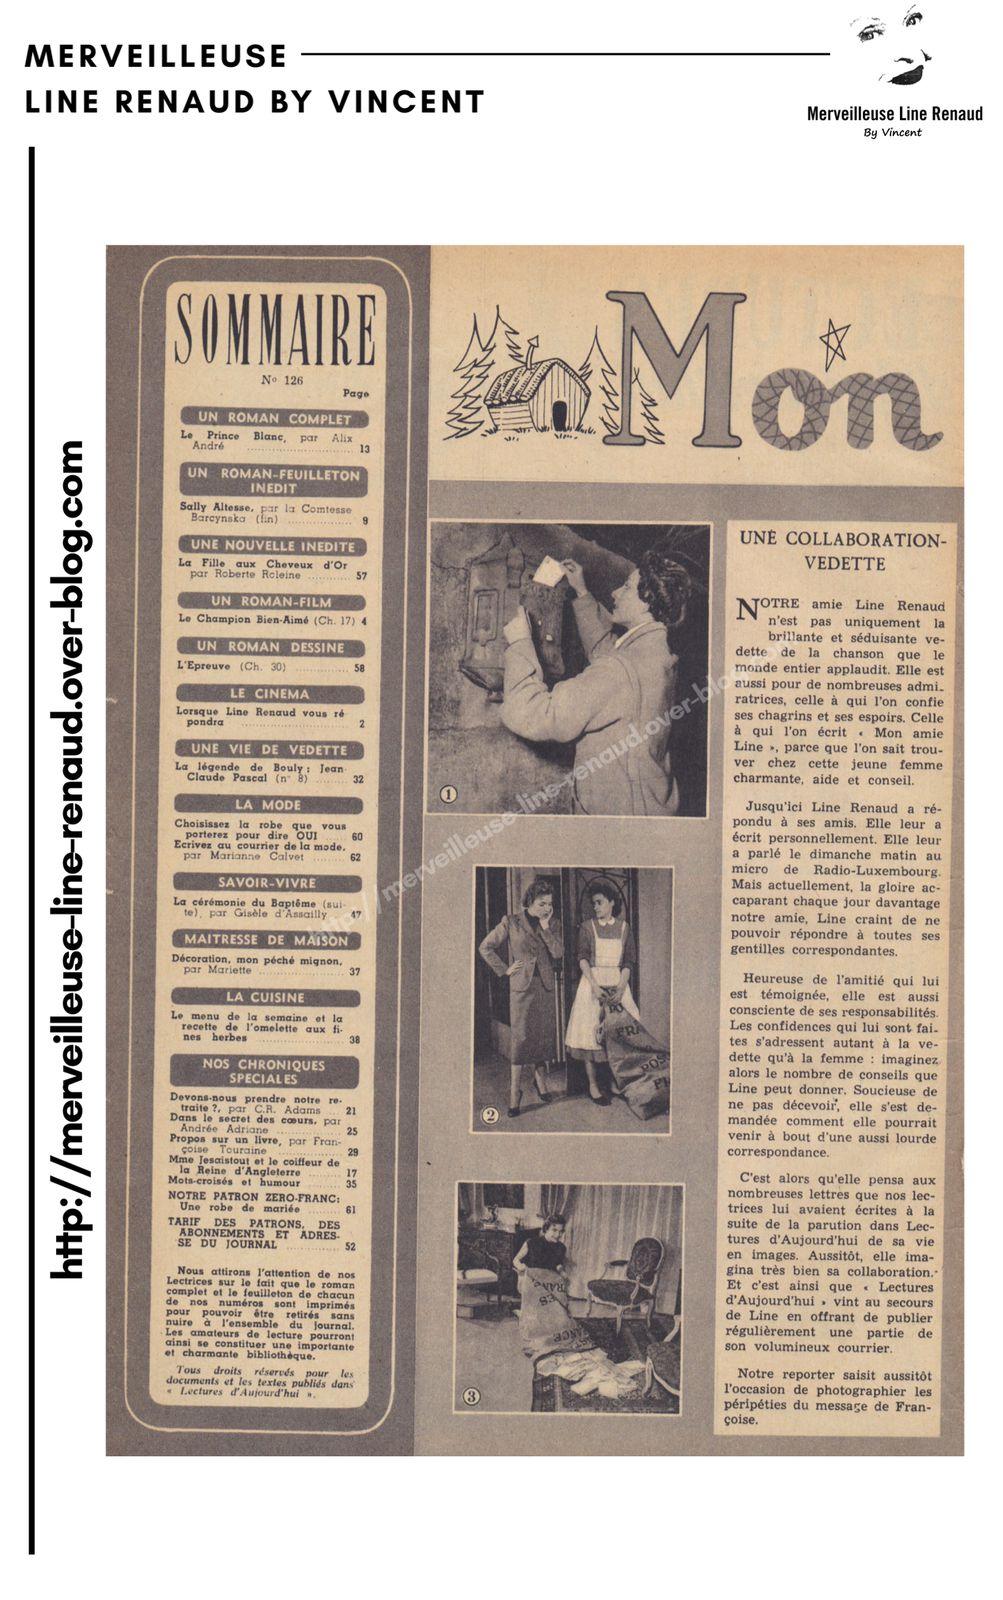 PRESSE: Lectures d'Aujourd'hui - n°128 - 29/01/1955